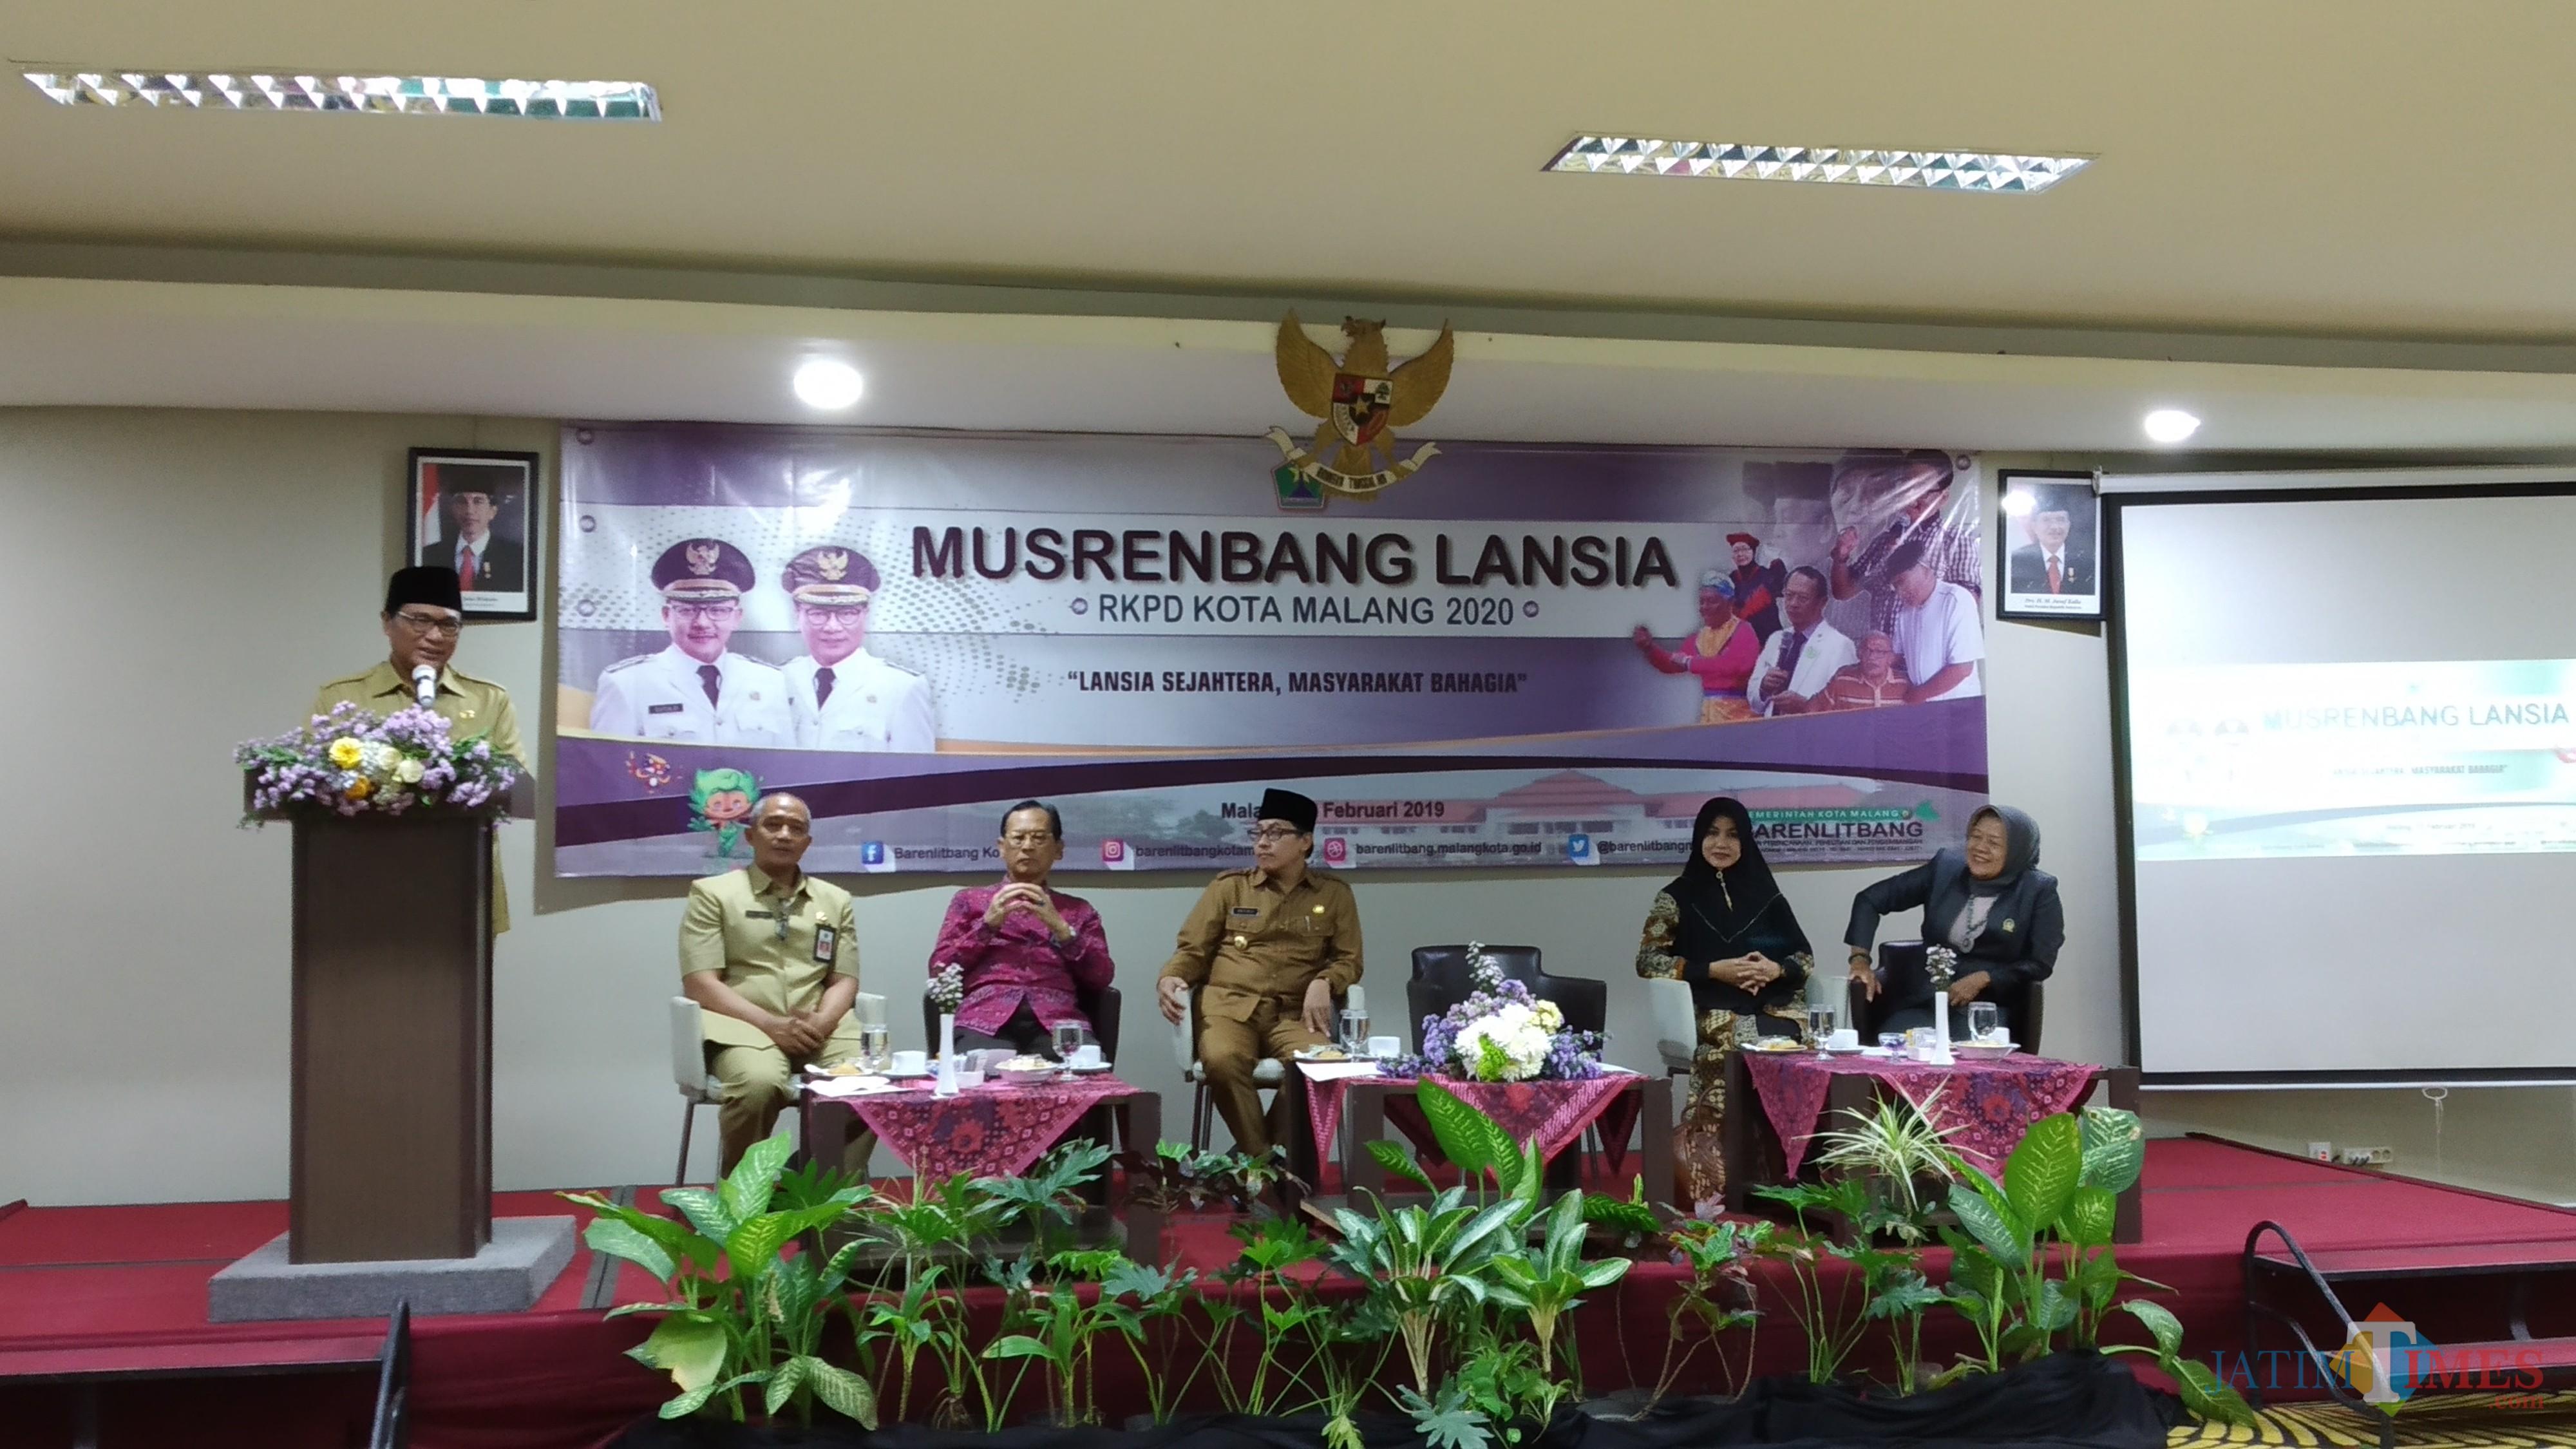 Wakil Wali Kota Malang, Sofyan Edi Jarwoko saat membuka Musrenbang Lansia di Hotel Savana yang juga dihadiri Wali Kota Malang, Sutiaji (duduk, tiga dari kiri) (Pipit Anggraeni/MalangTIMES).